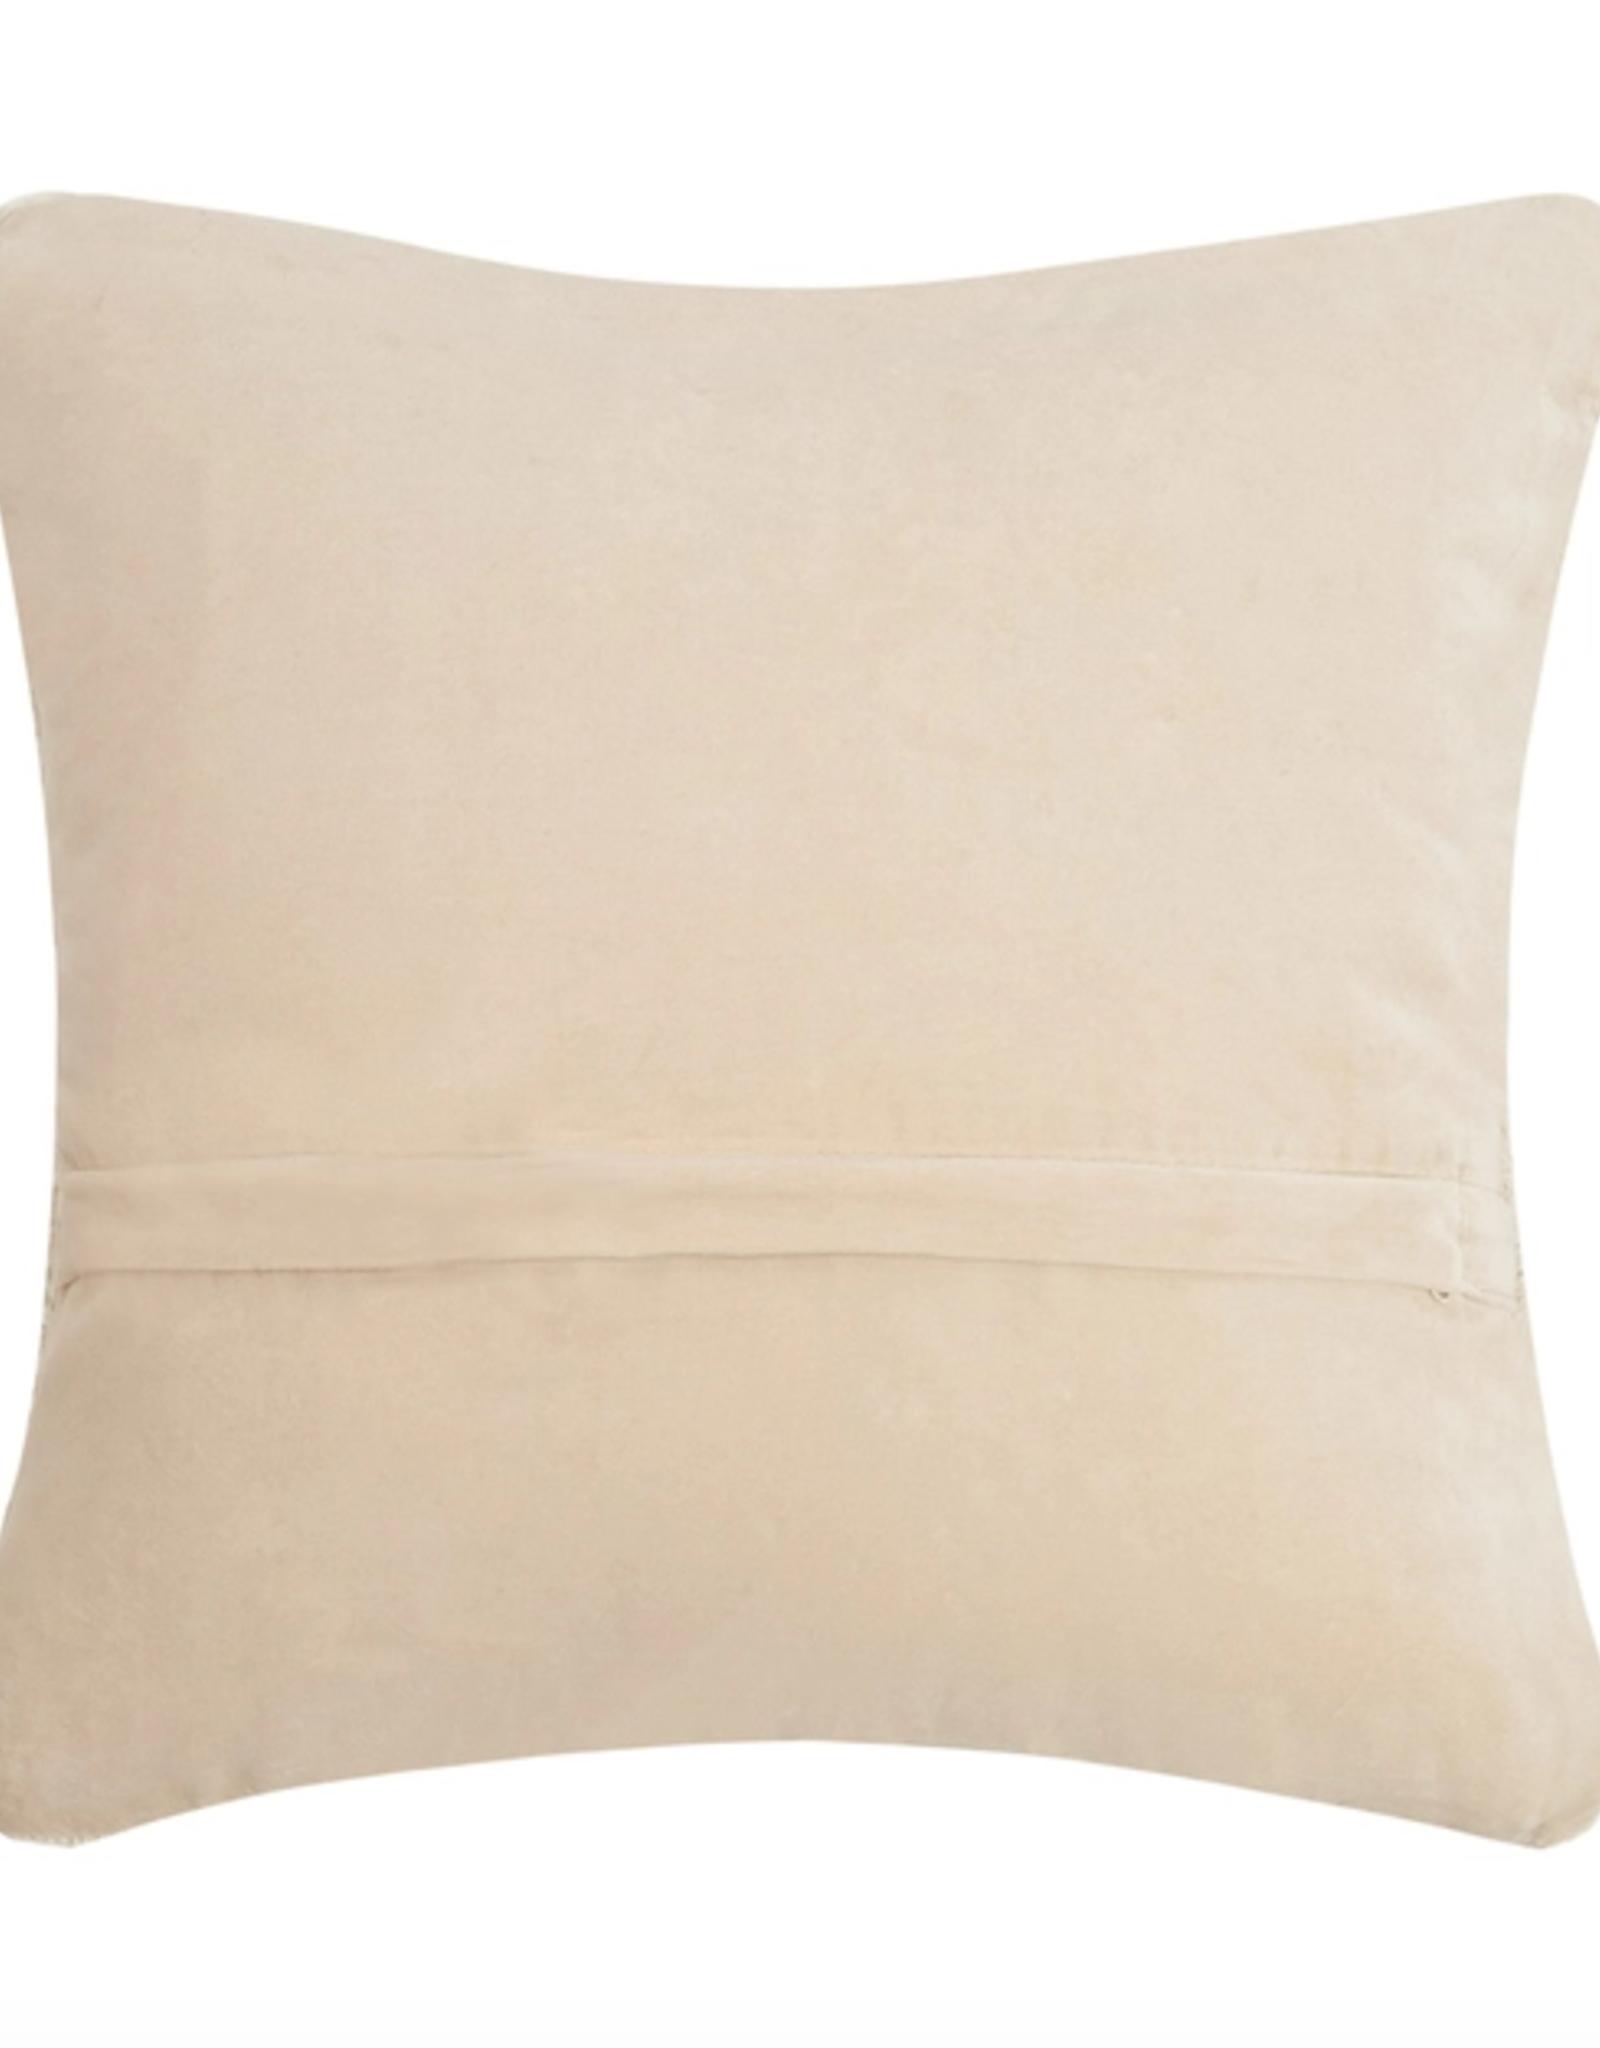 Peking Handicraft Sagittarius Hook Pillow